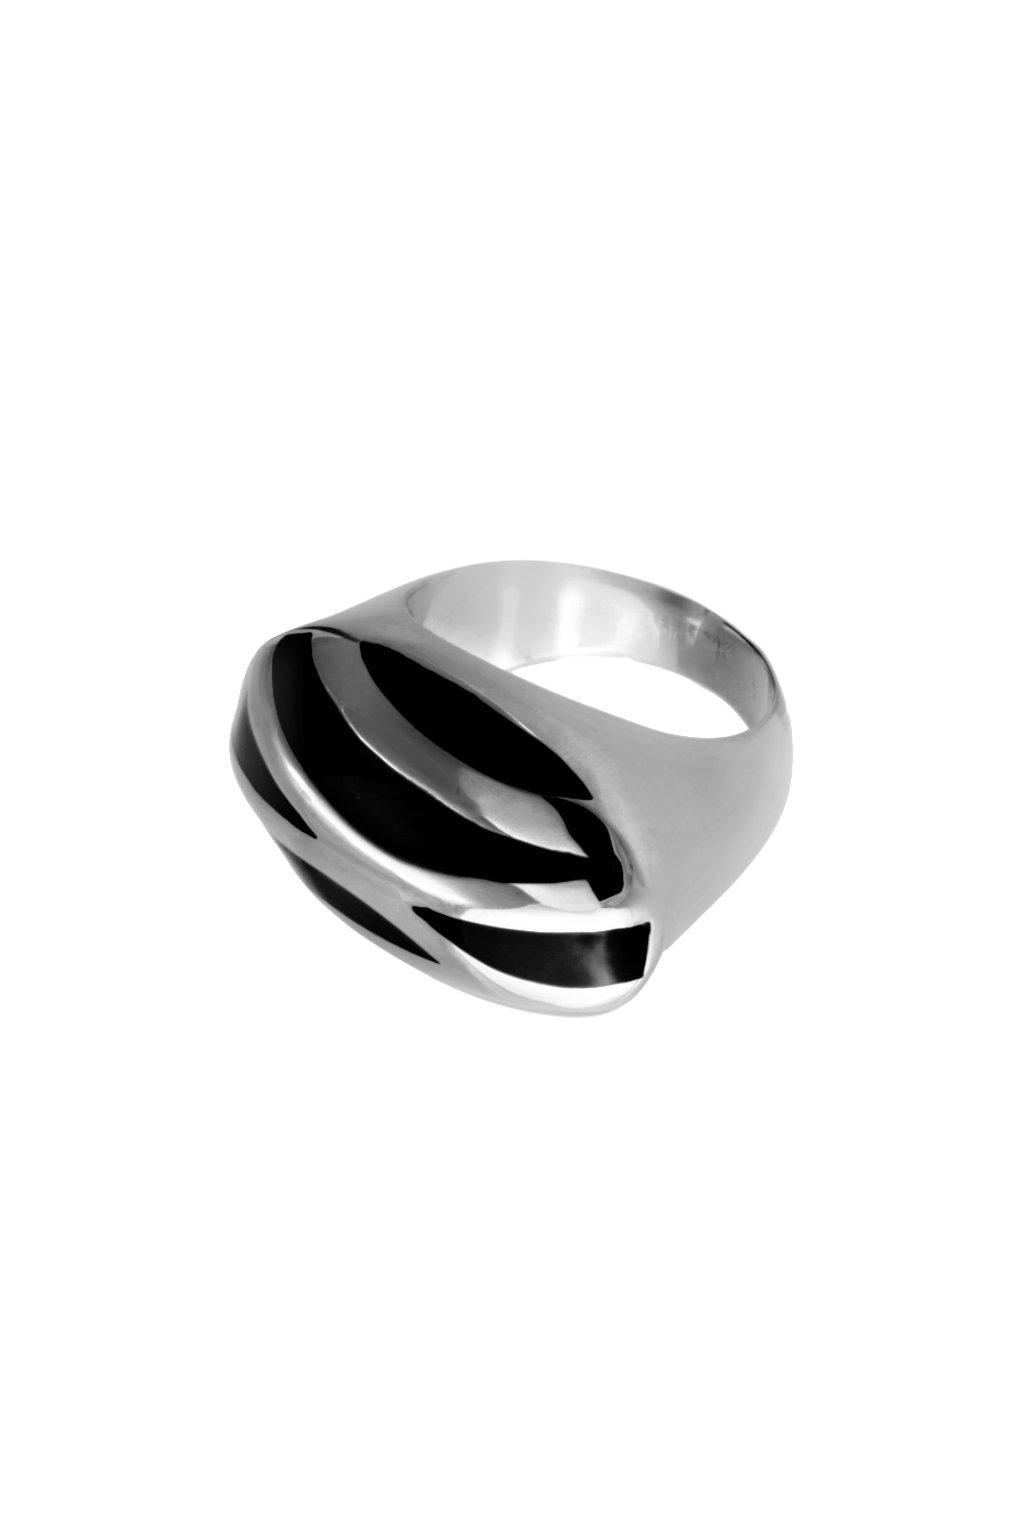 Skalimar Prsten z chirurgické oceli S ŽÍHANÝM ORNAMENTEM 212172